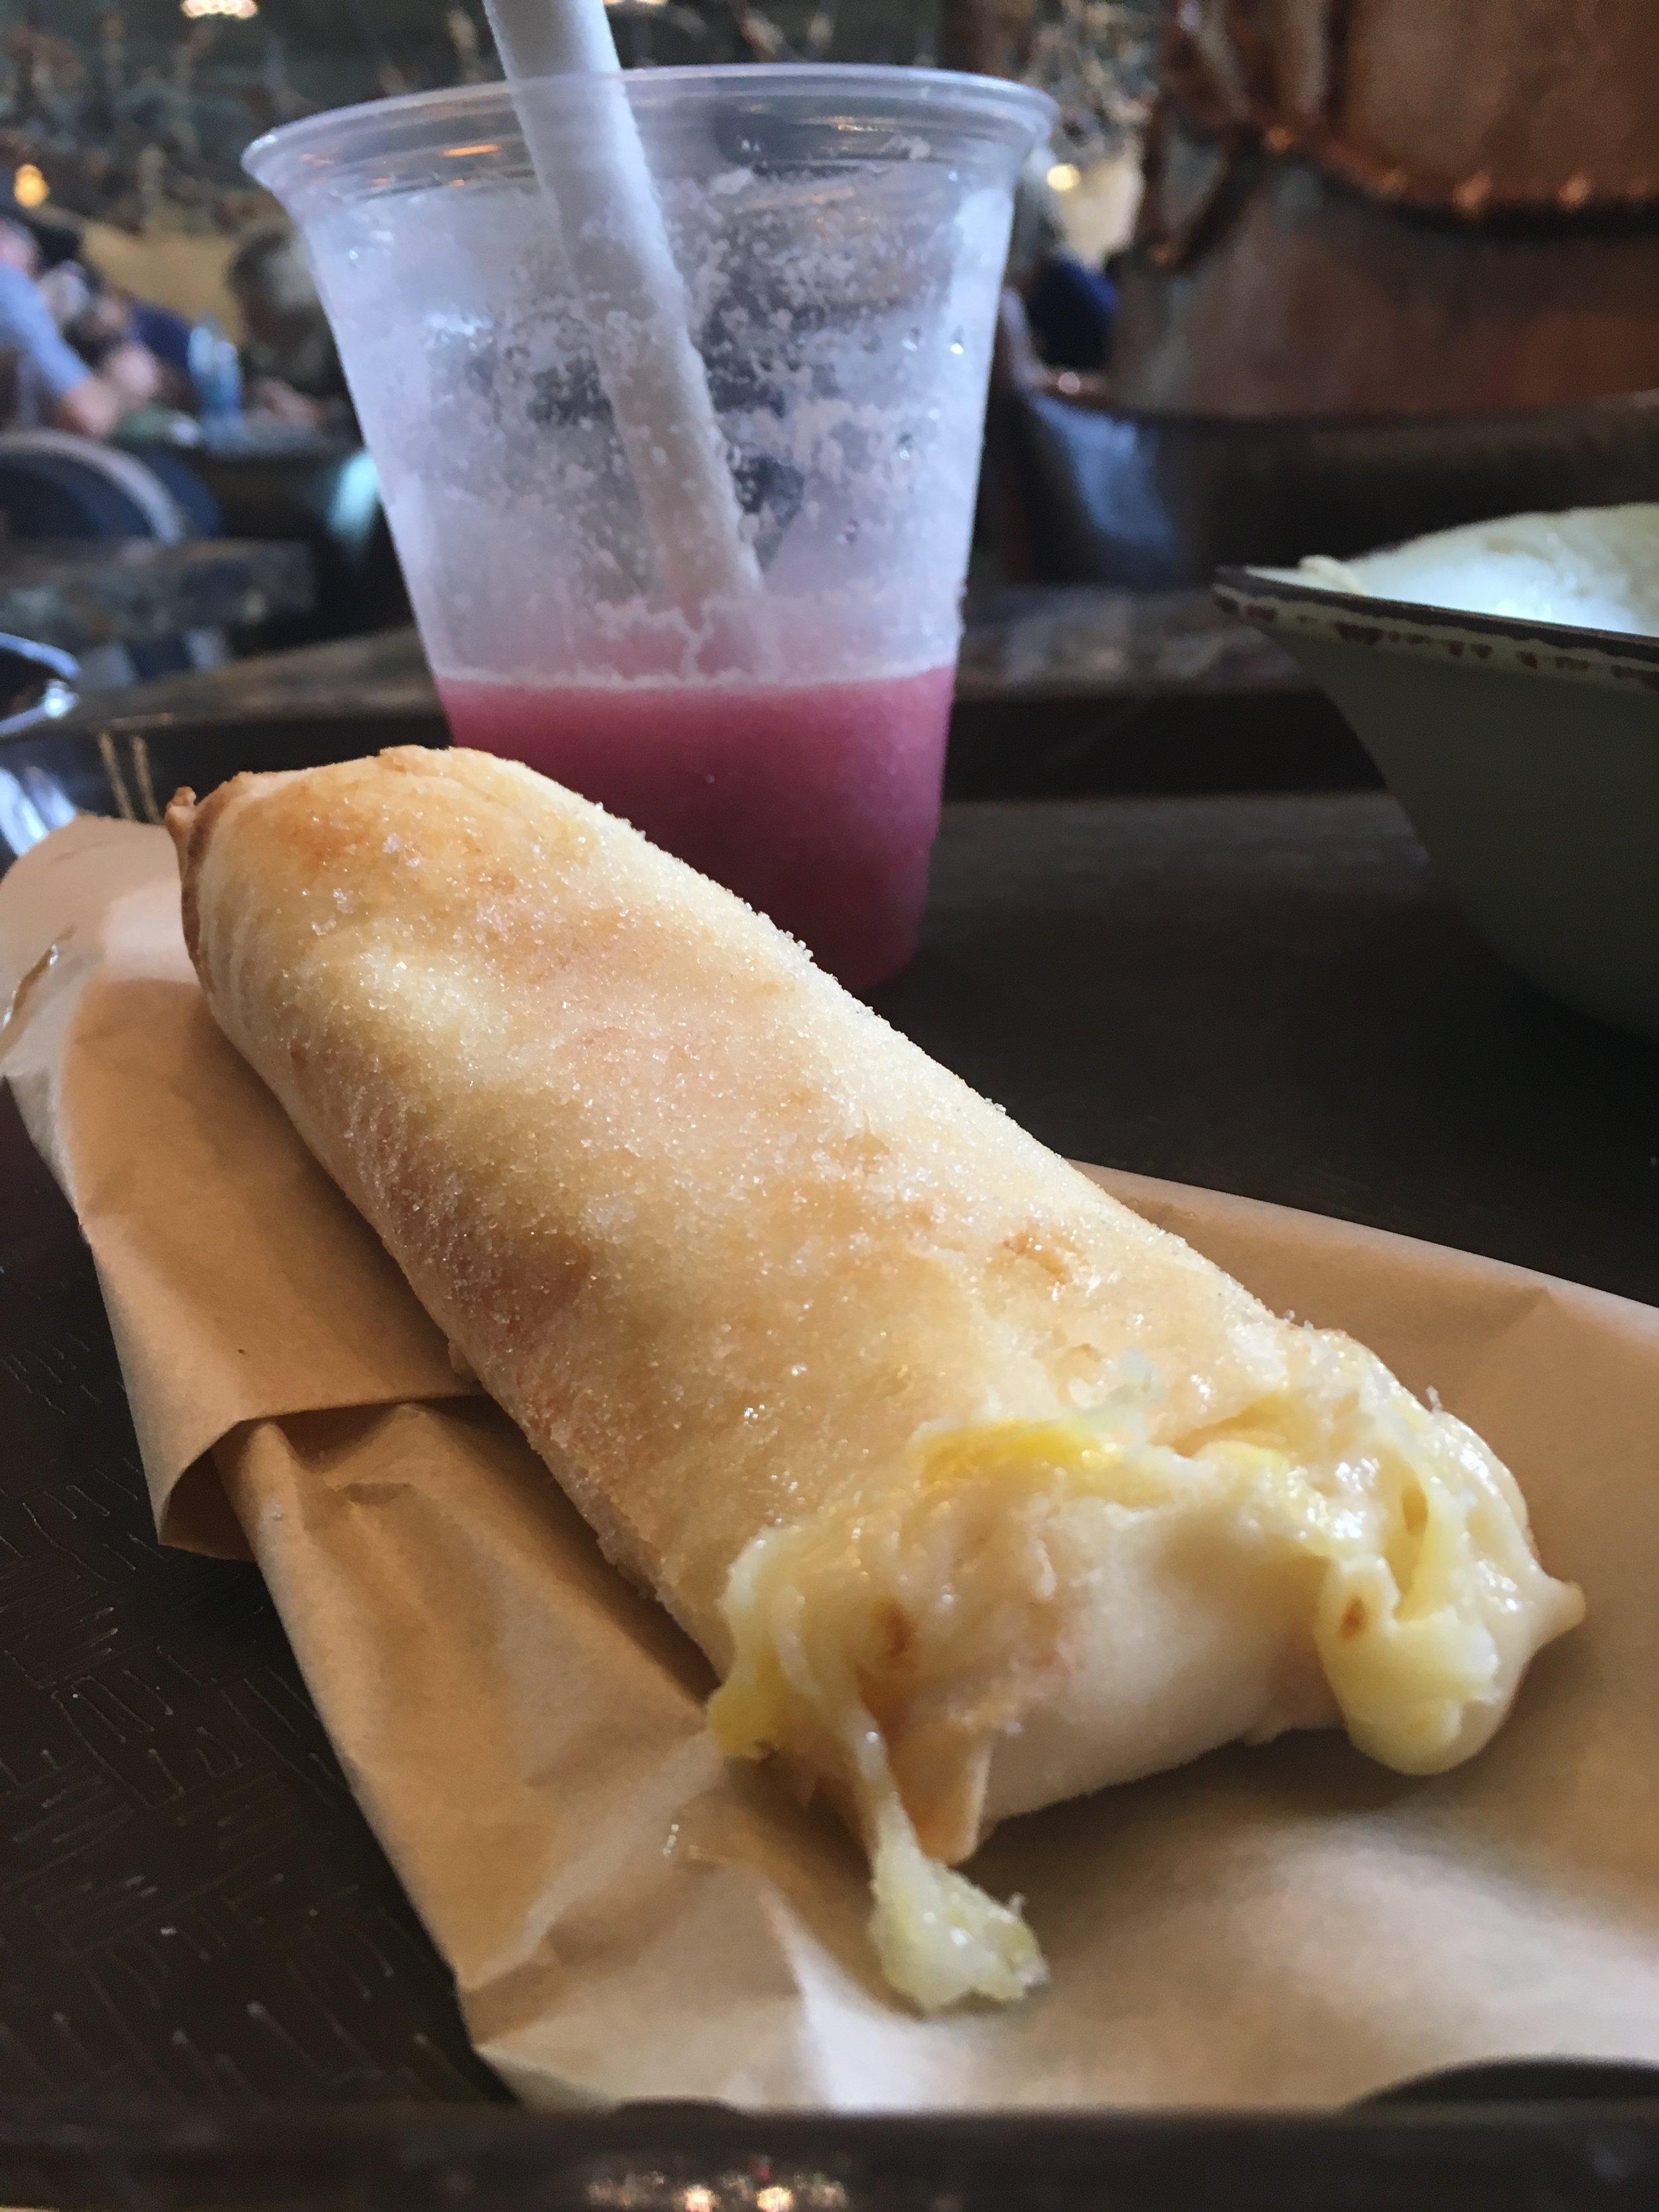 Pineapple cream-cheese lumpia